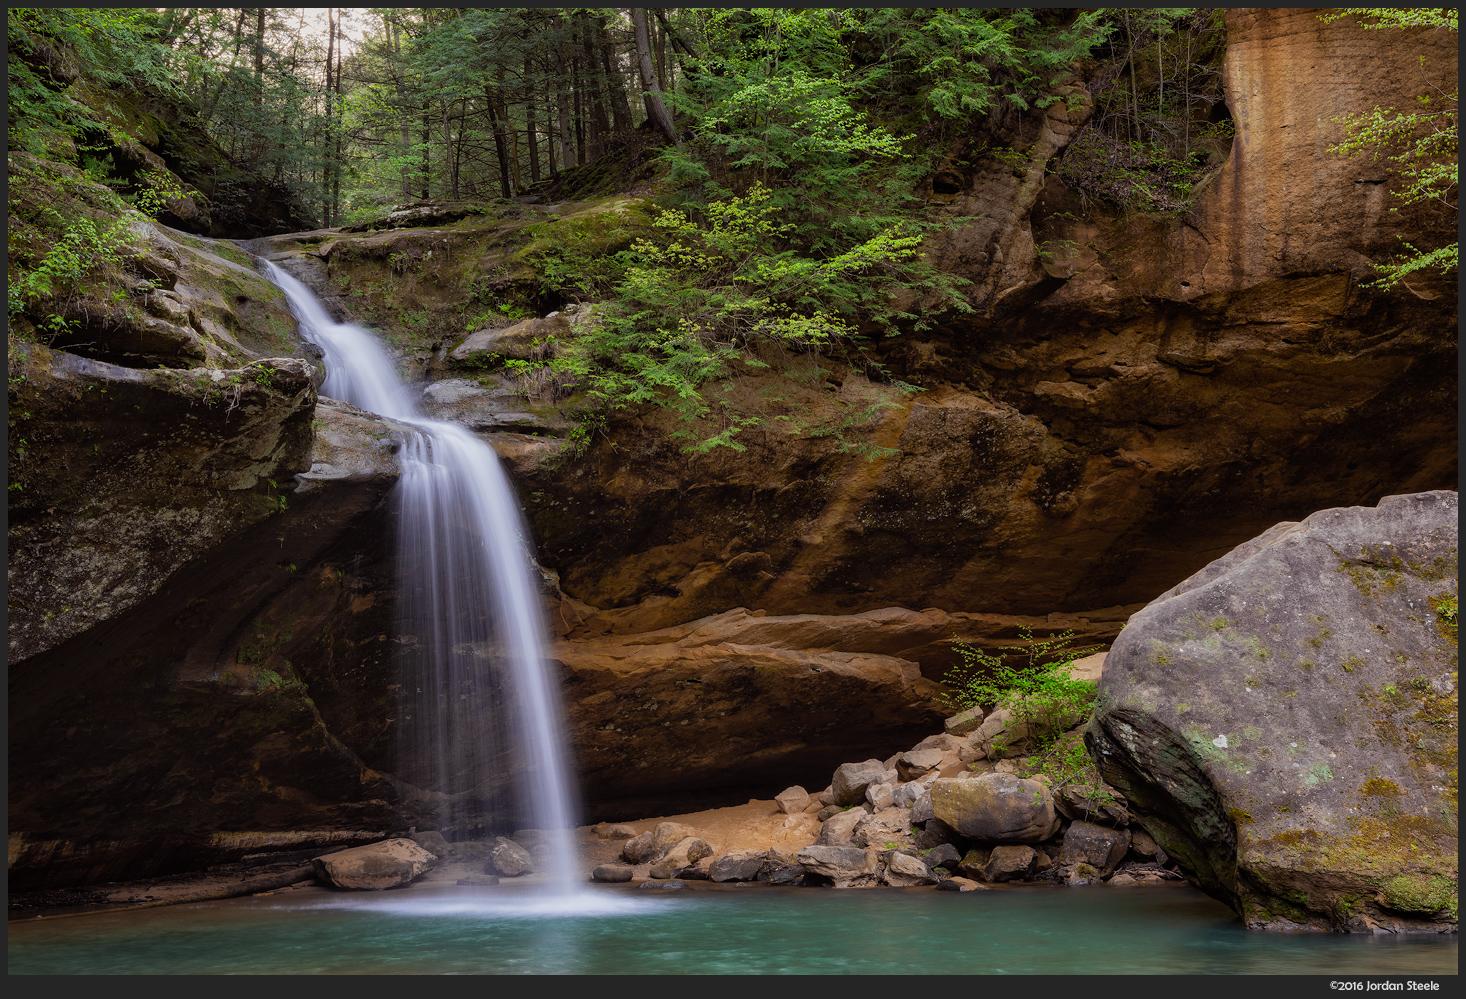 Lower Falls, Hocking Hills - Sony A7 II with Sony 24-70mm f/2.8 GM @